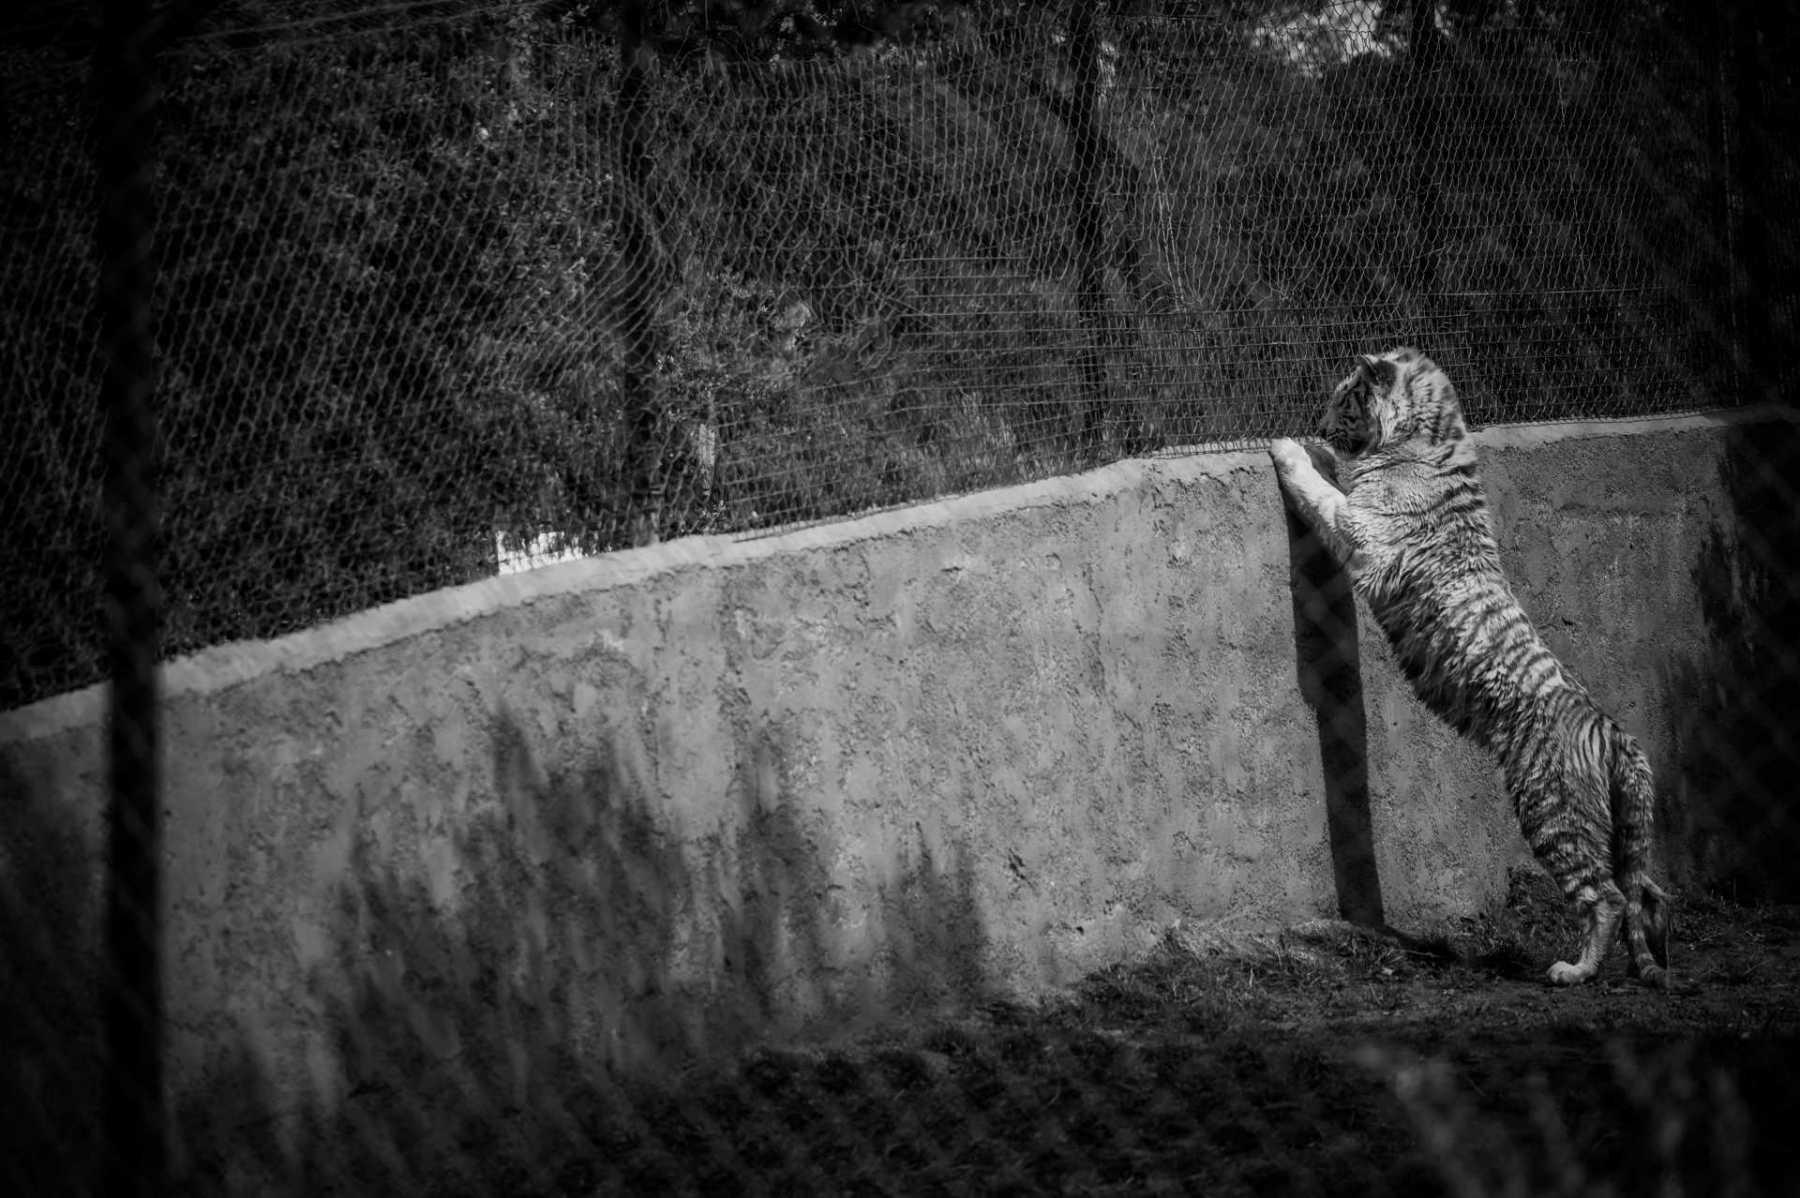 Tiger. France, 2016. JMcArthur / Born Free Foundation